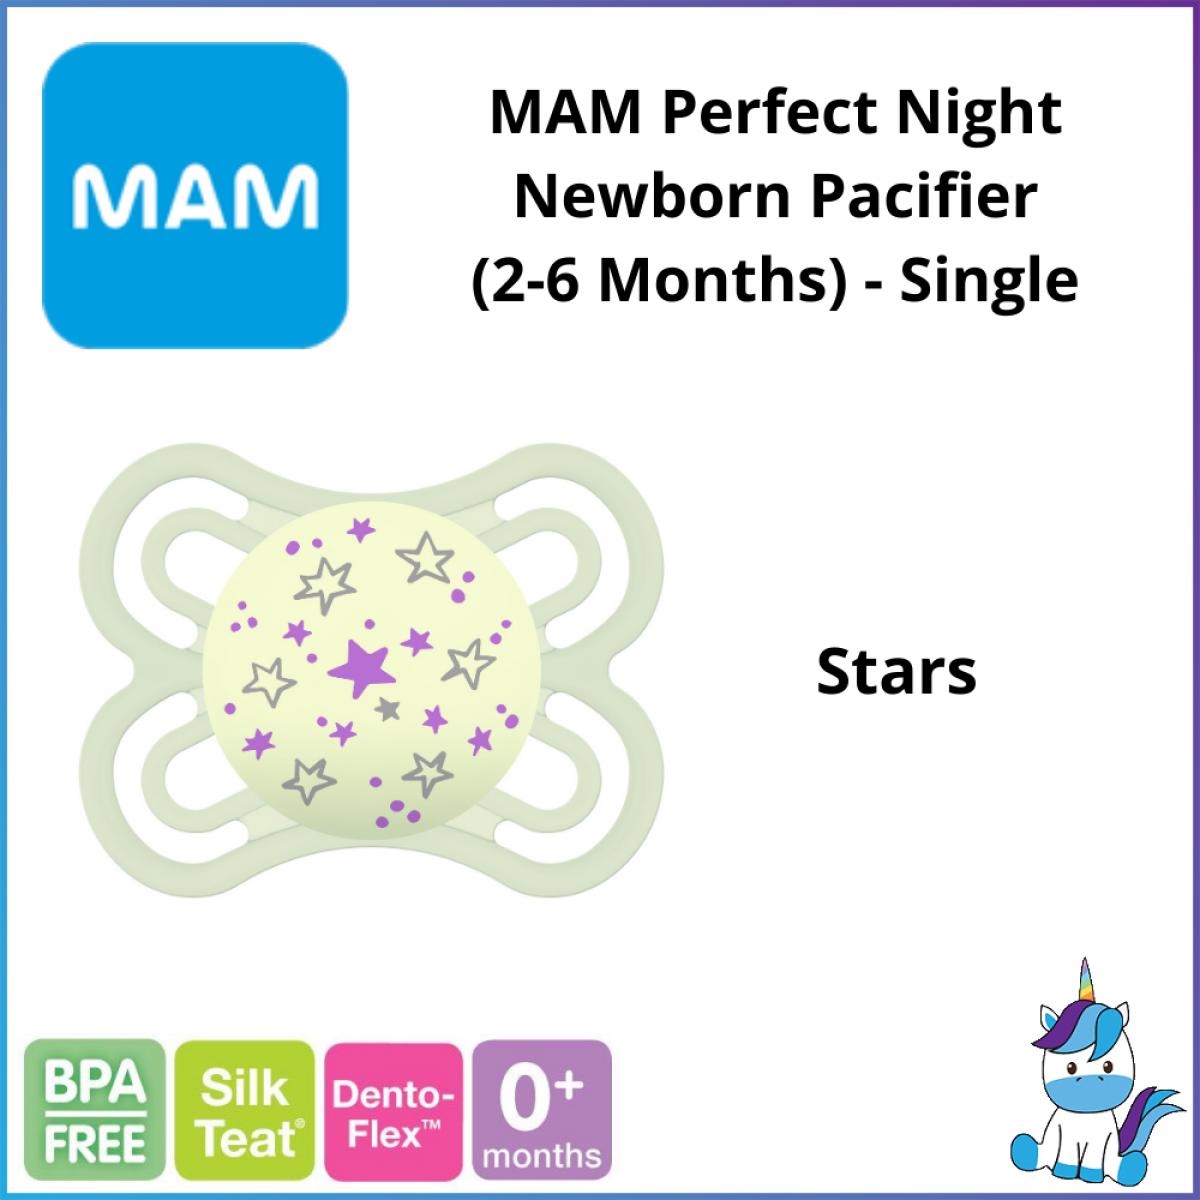 MAM Perfect Night Newborn Pacifier (2-6 Months) - Single